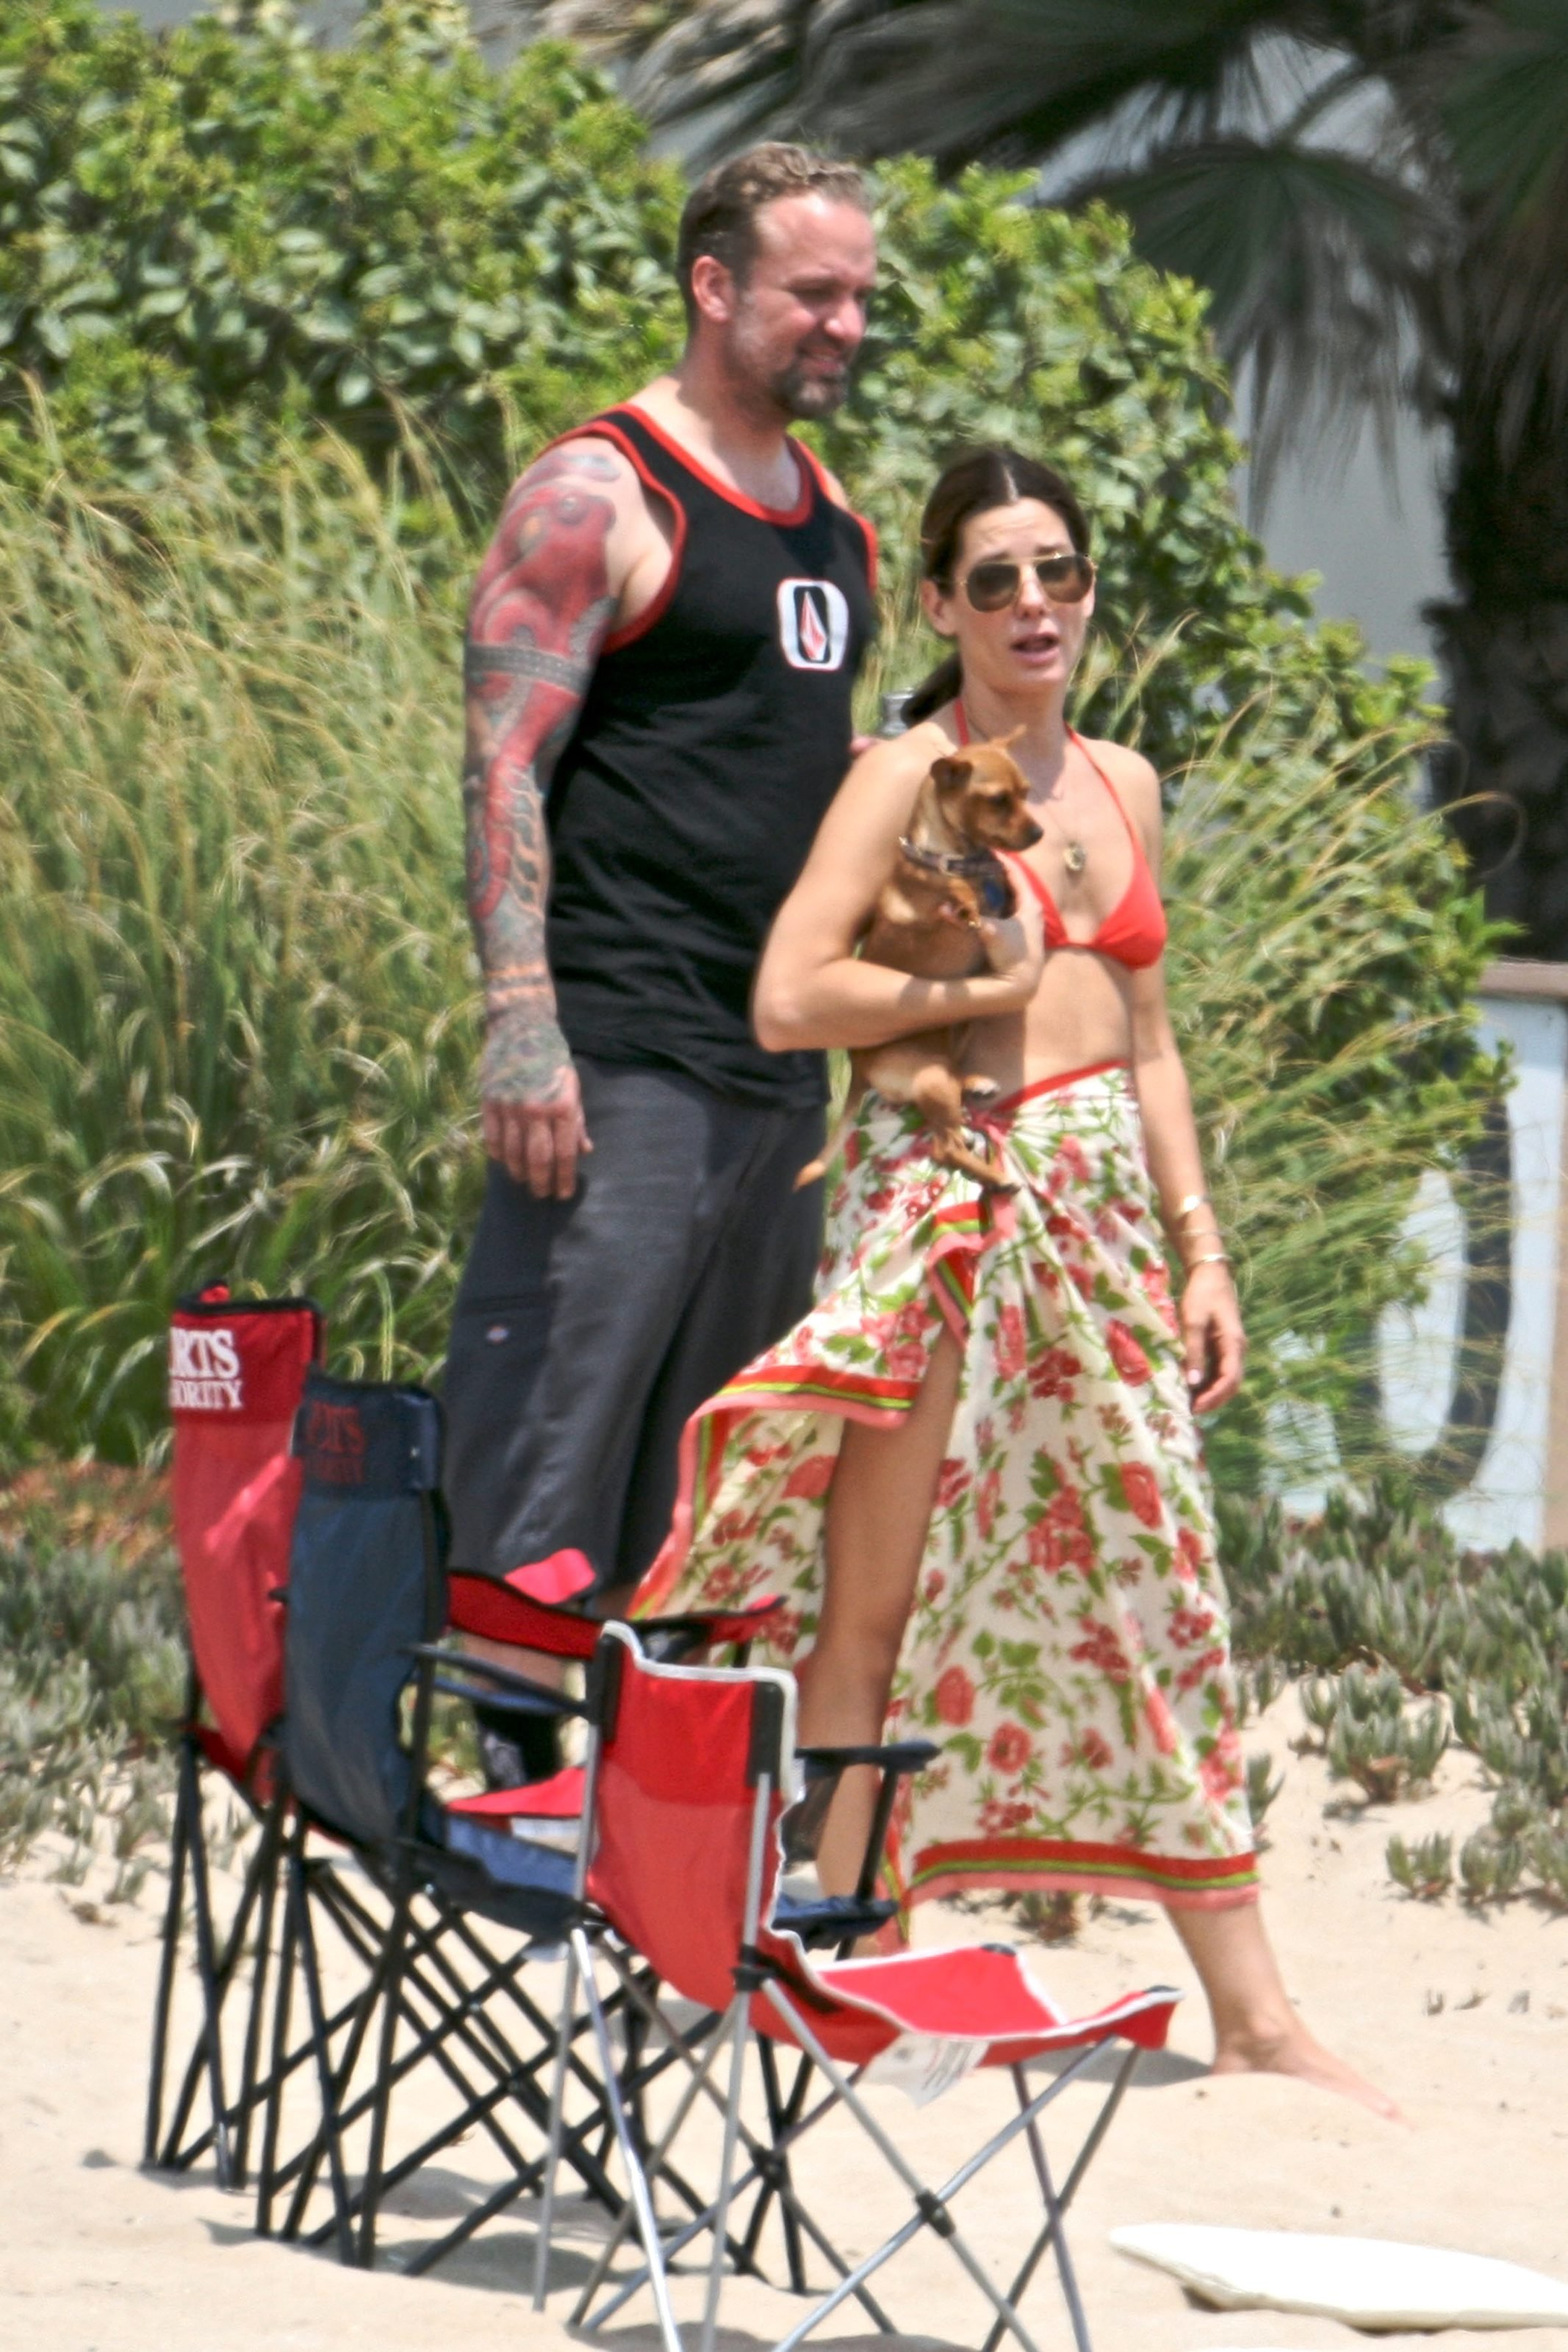 79544_Celebutopia-Sandra_Bullock_in_top_bikini_and_husband_host_an_Independence_Day_beach_party-11_122_547lo.jpg